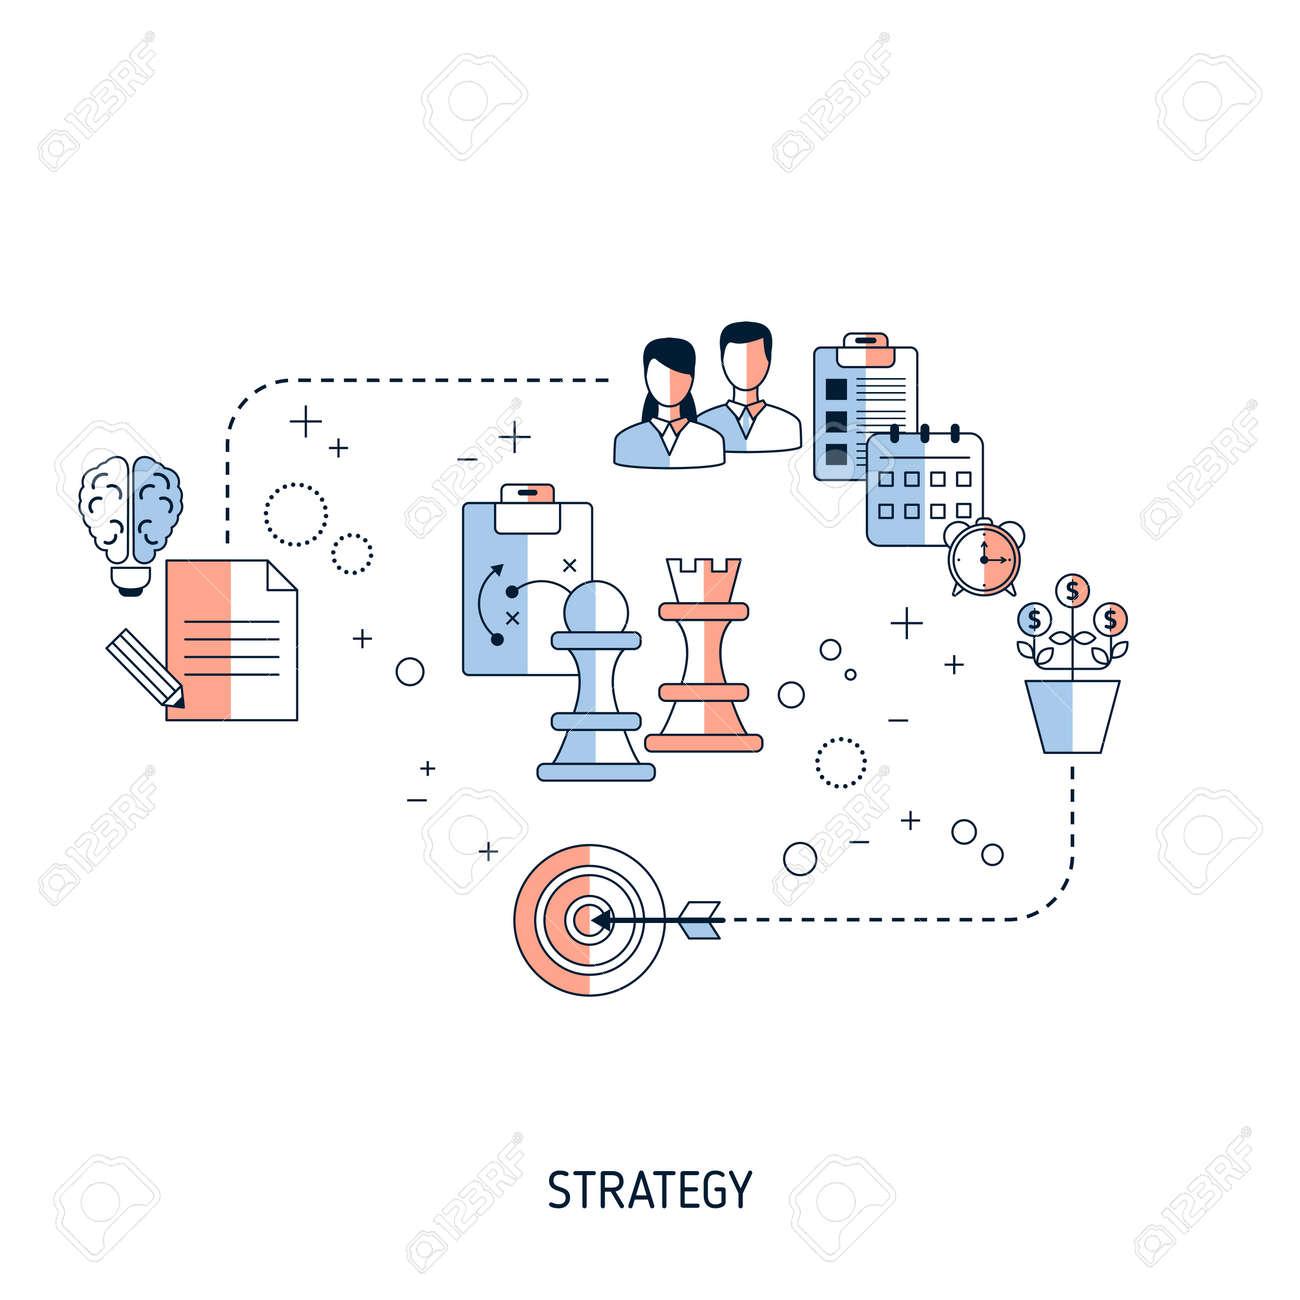 Business Strategy concept. Vector illustration for website, app, banner, etc. - 146164817